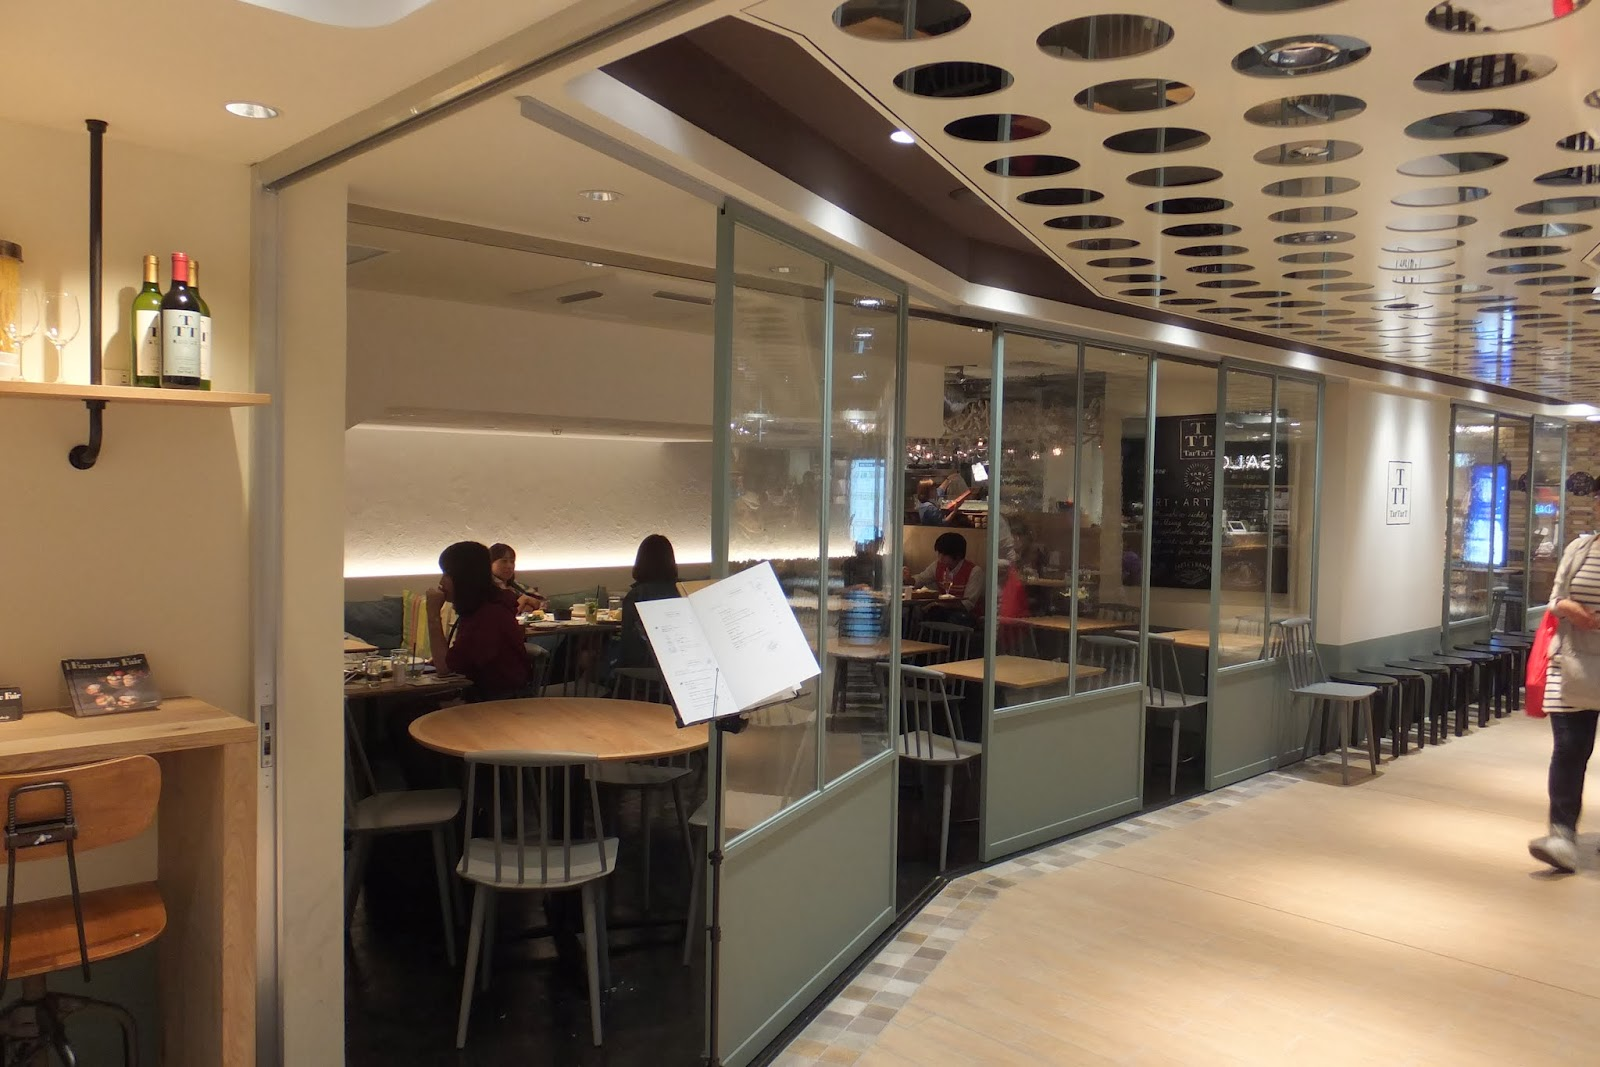 cafe-kichijoji-station 吉祥寺駅のカフェ